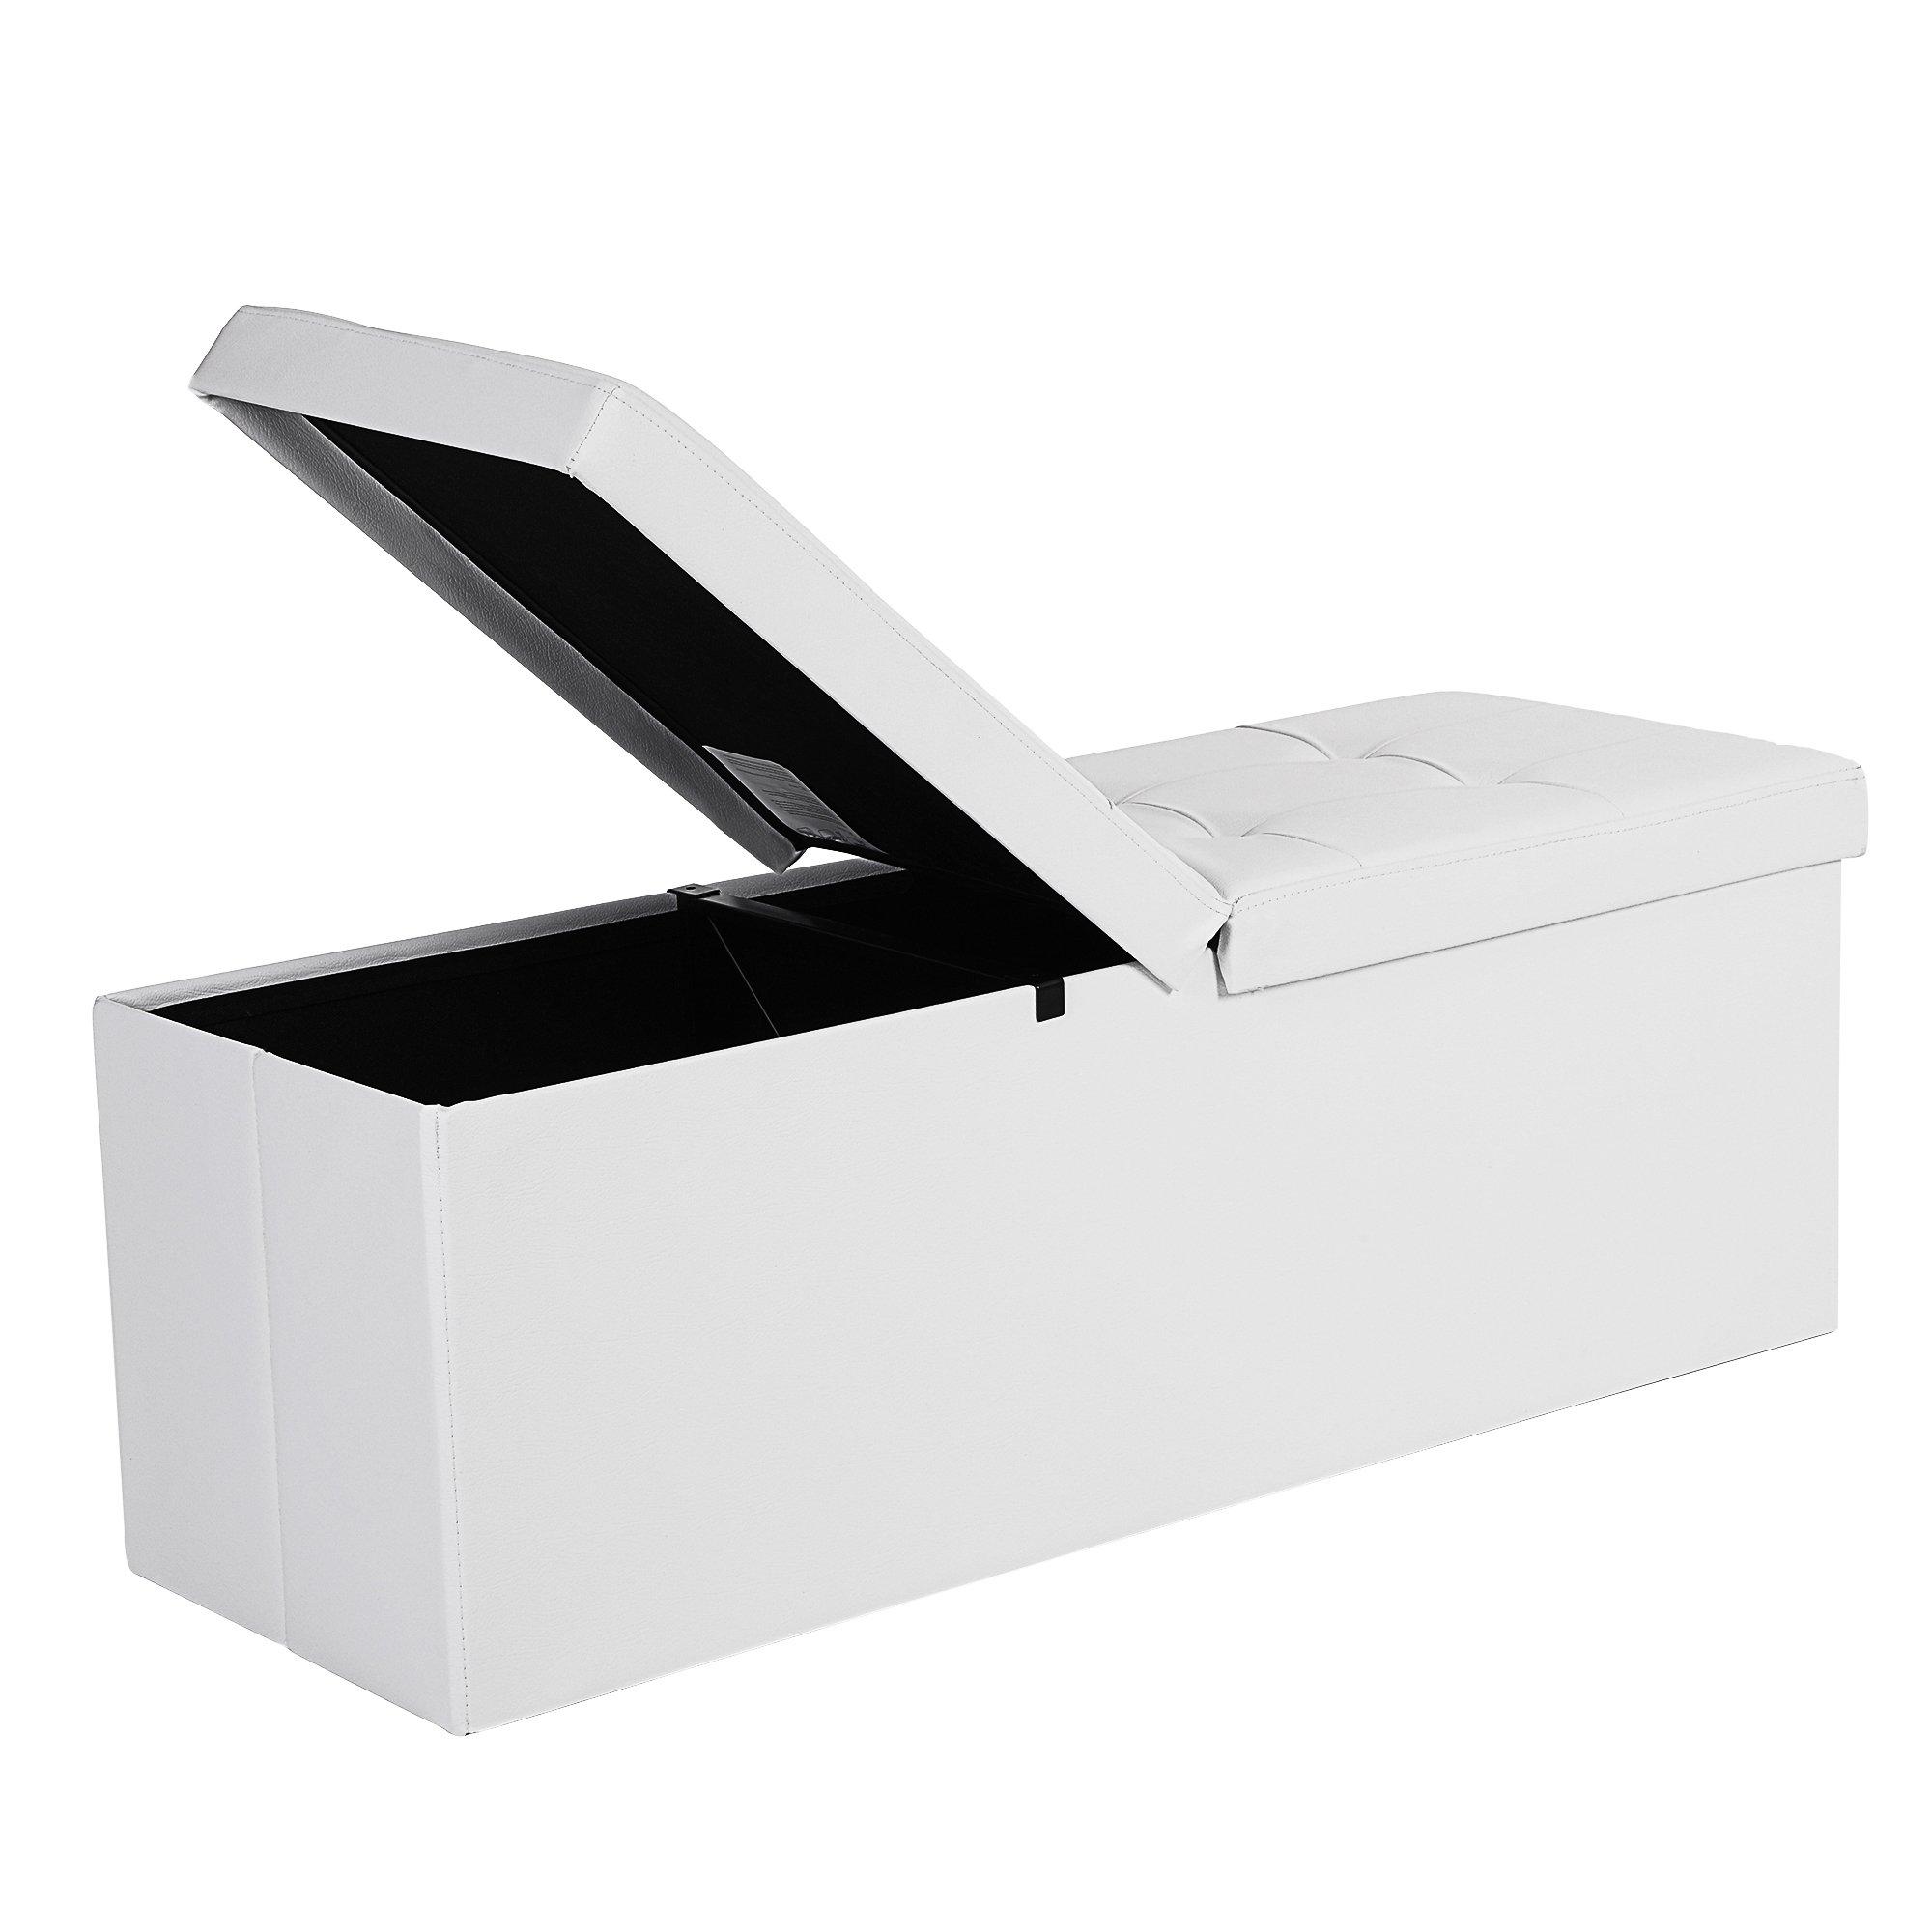 SONGMICS Baúl Puff Taburete para almacenaje Plegable Carga Máxima de 300 kg Blanco 110 x 38